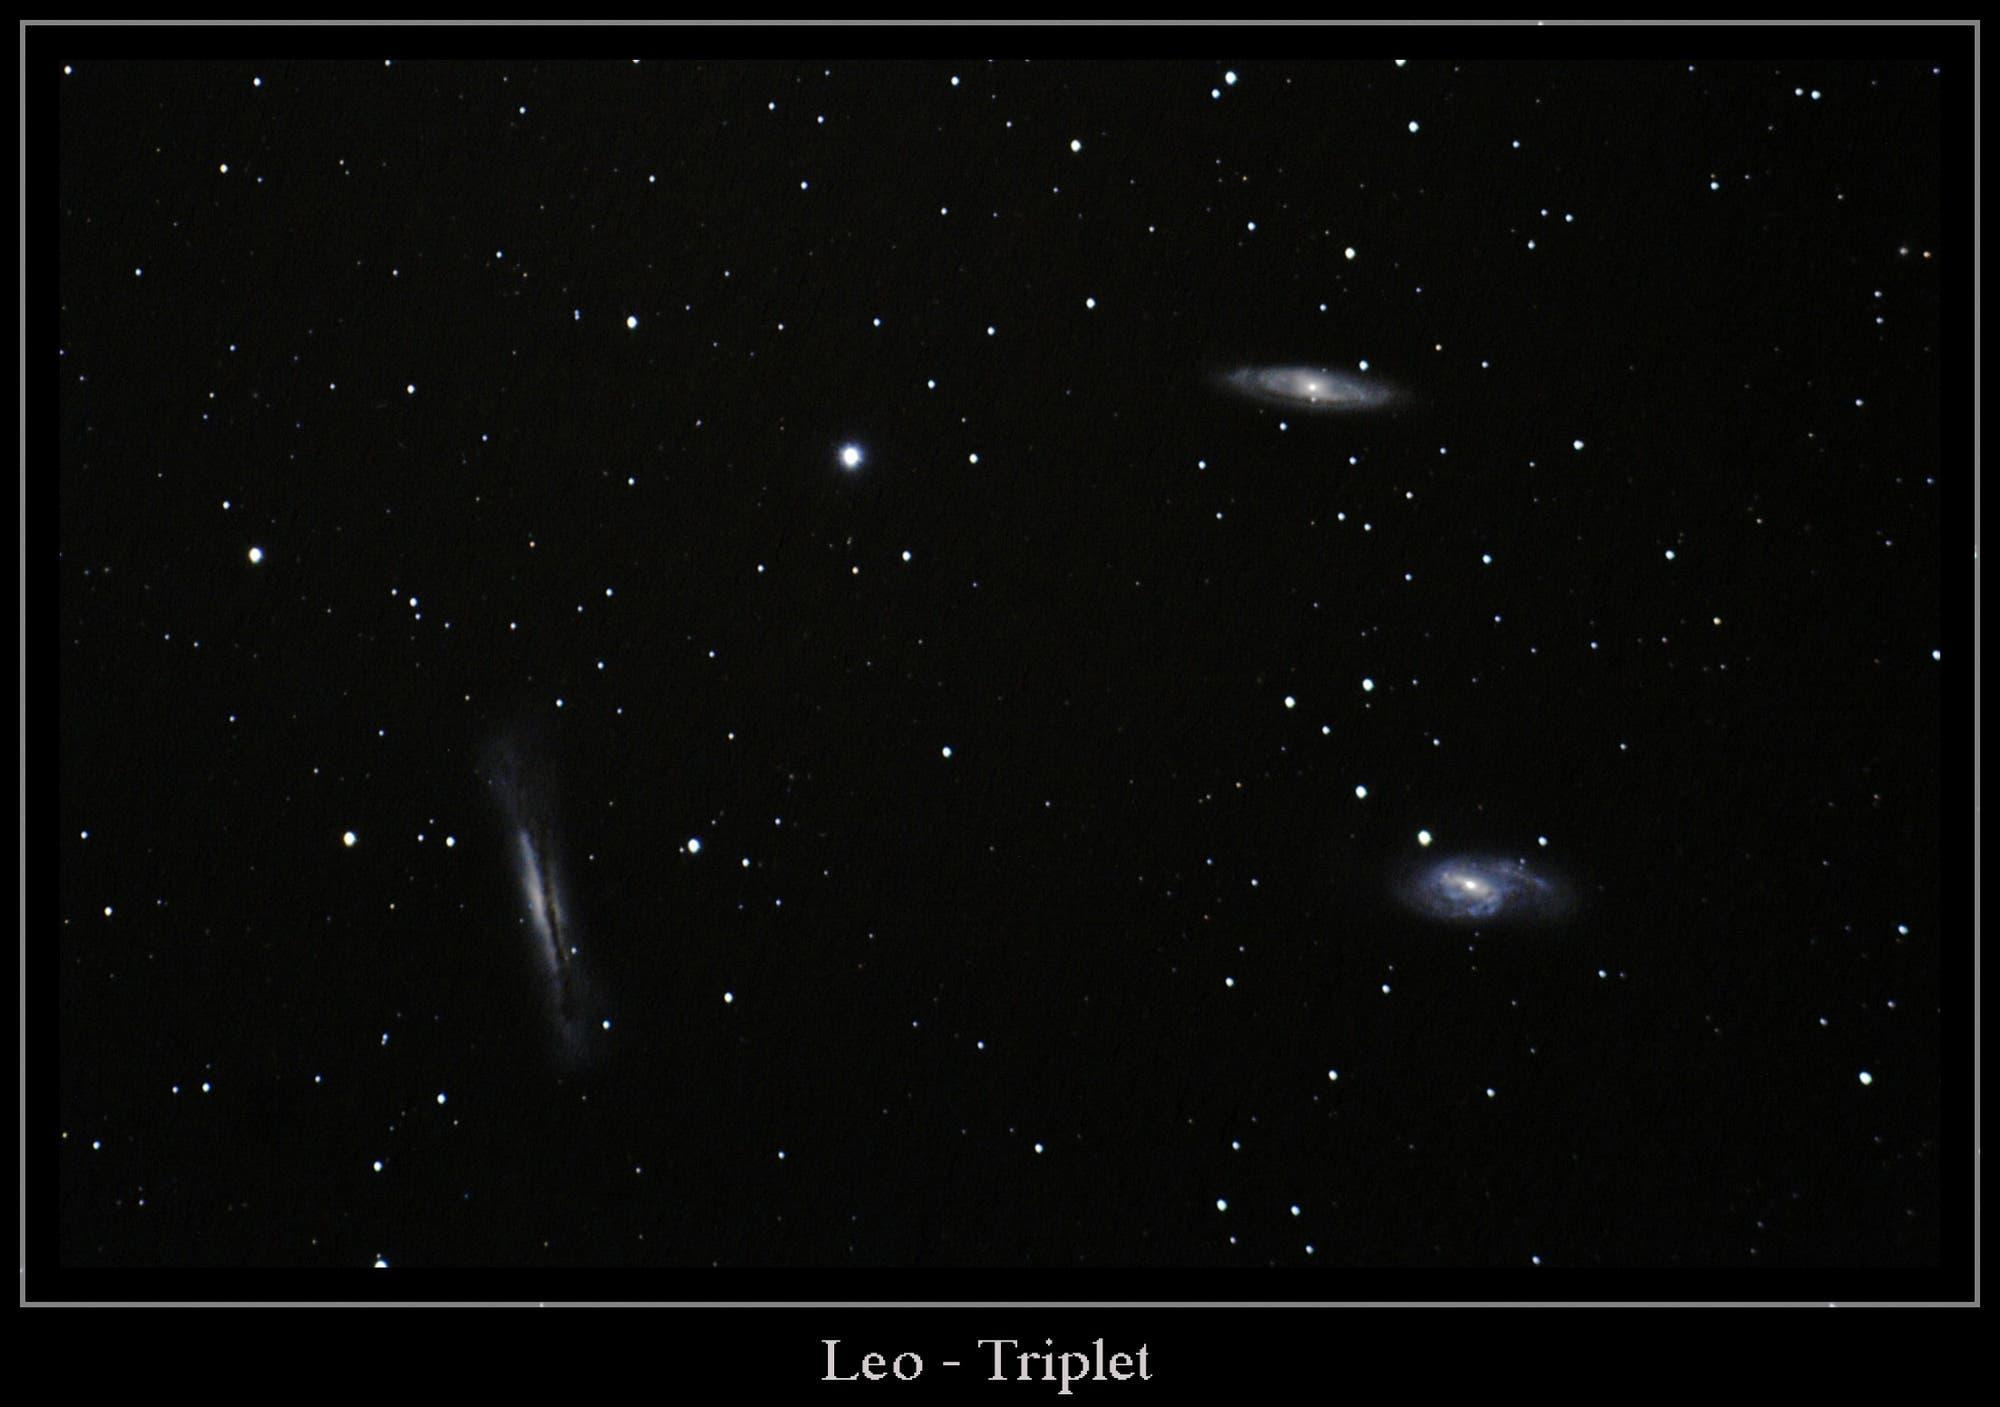 Leo-Triplet